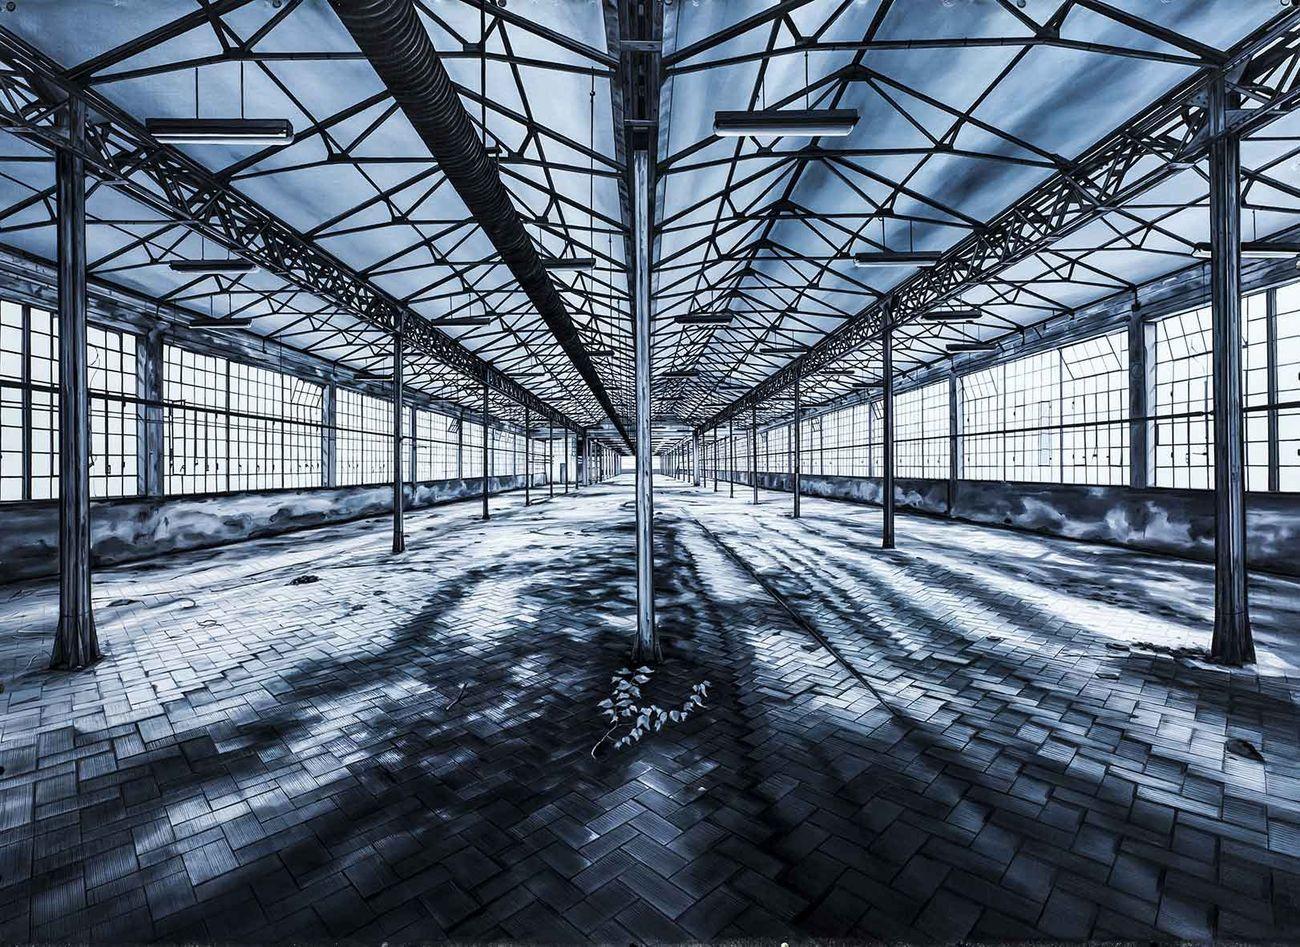 Andrea Chiesi, Eschatos 22, olio su lino, cm 100x140